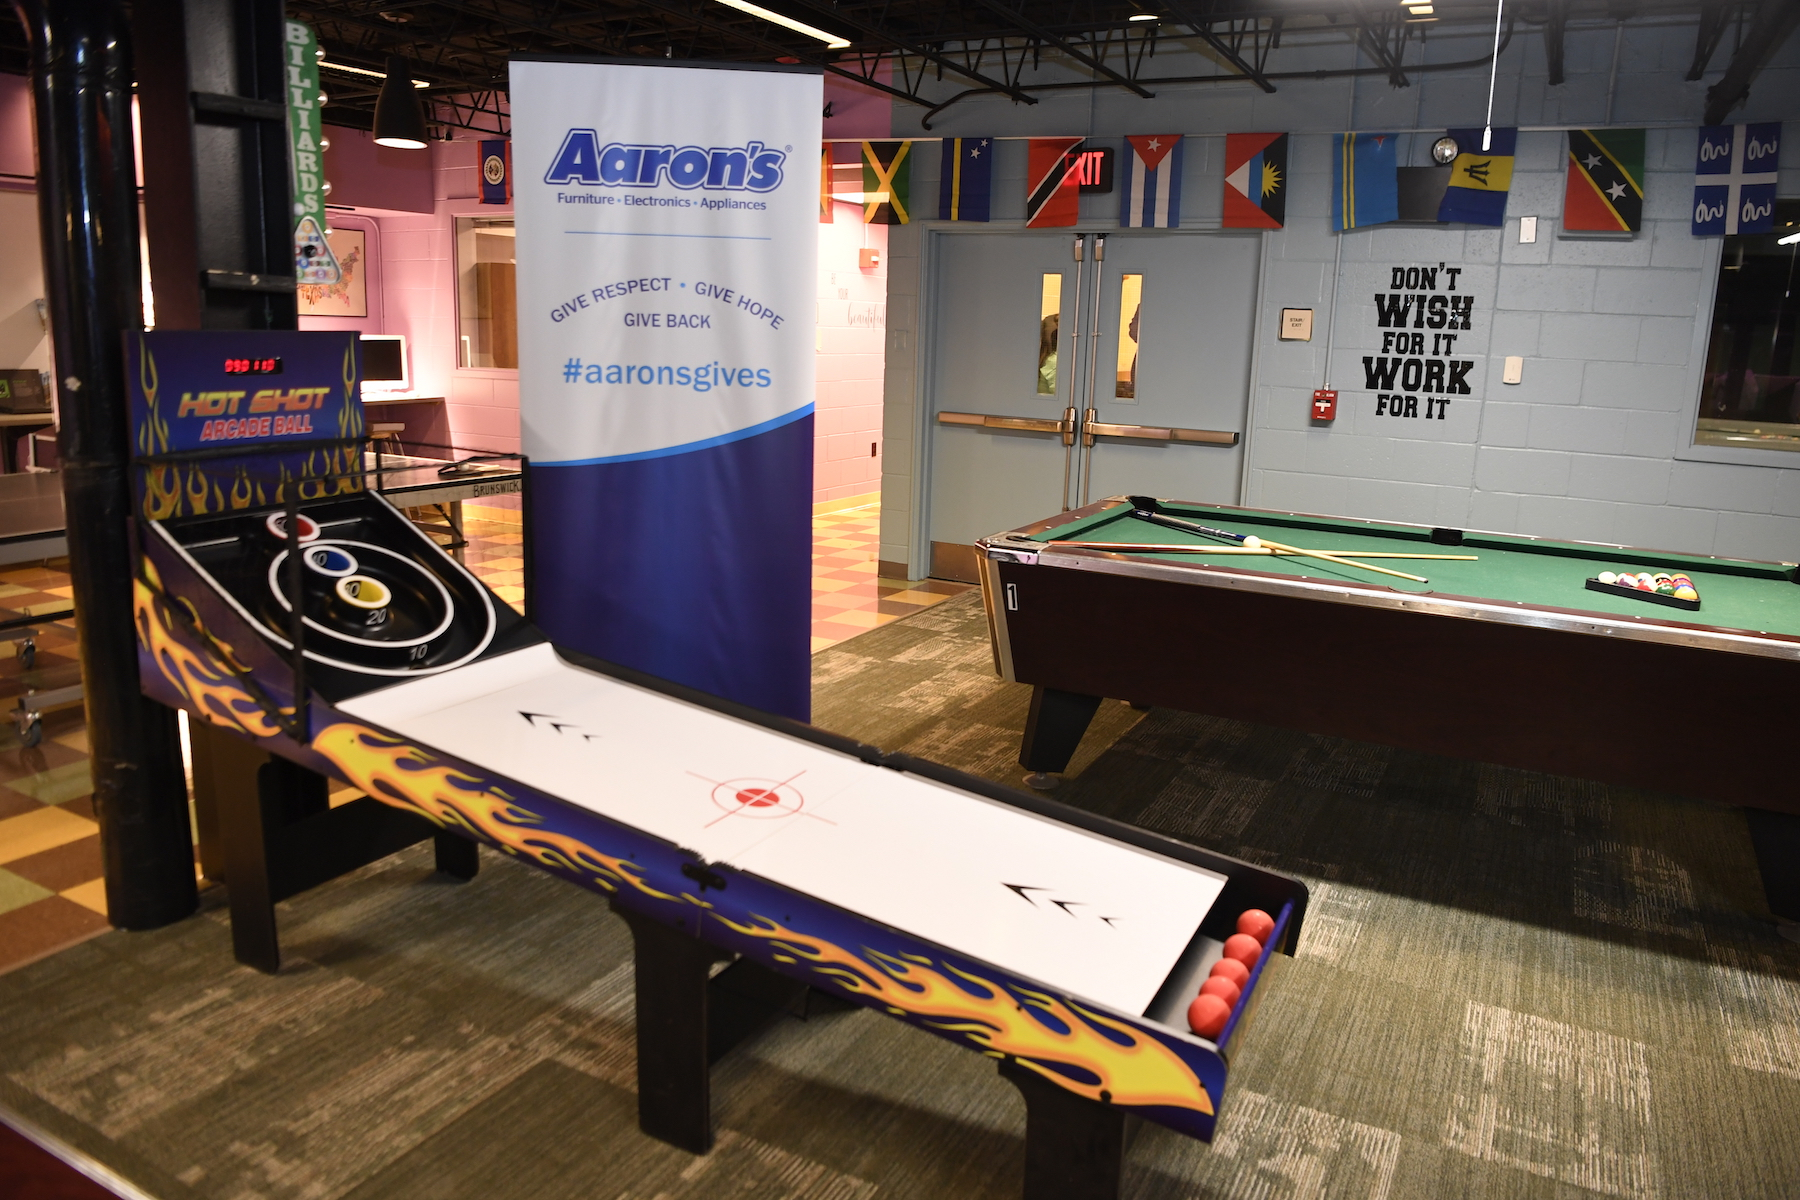 In 2015, The Aaronu0027s Foundation, Inc. Announced A Three Year, $5 Million  National Partnership With Boys U0026 Girls Clubs Of Americau0027s Keystone Program,  ...